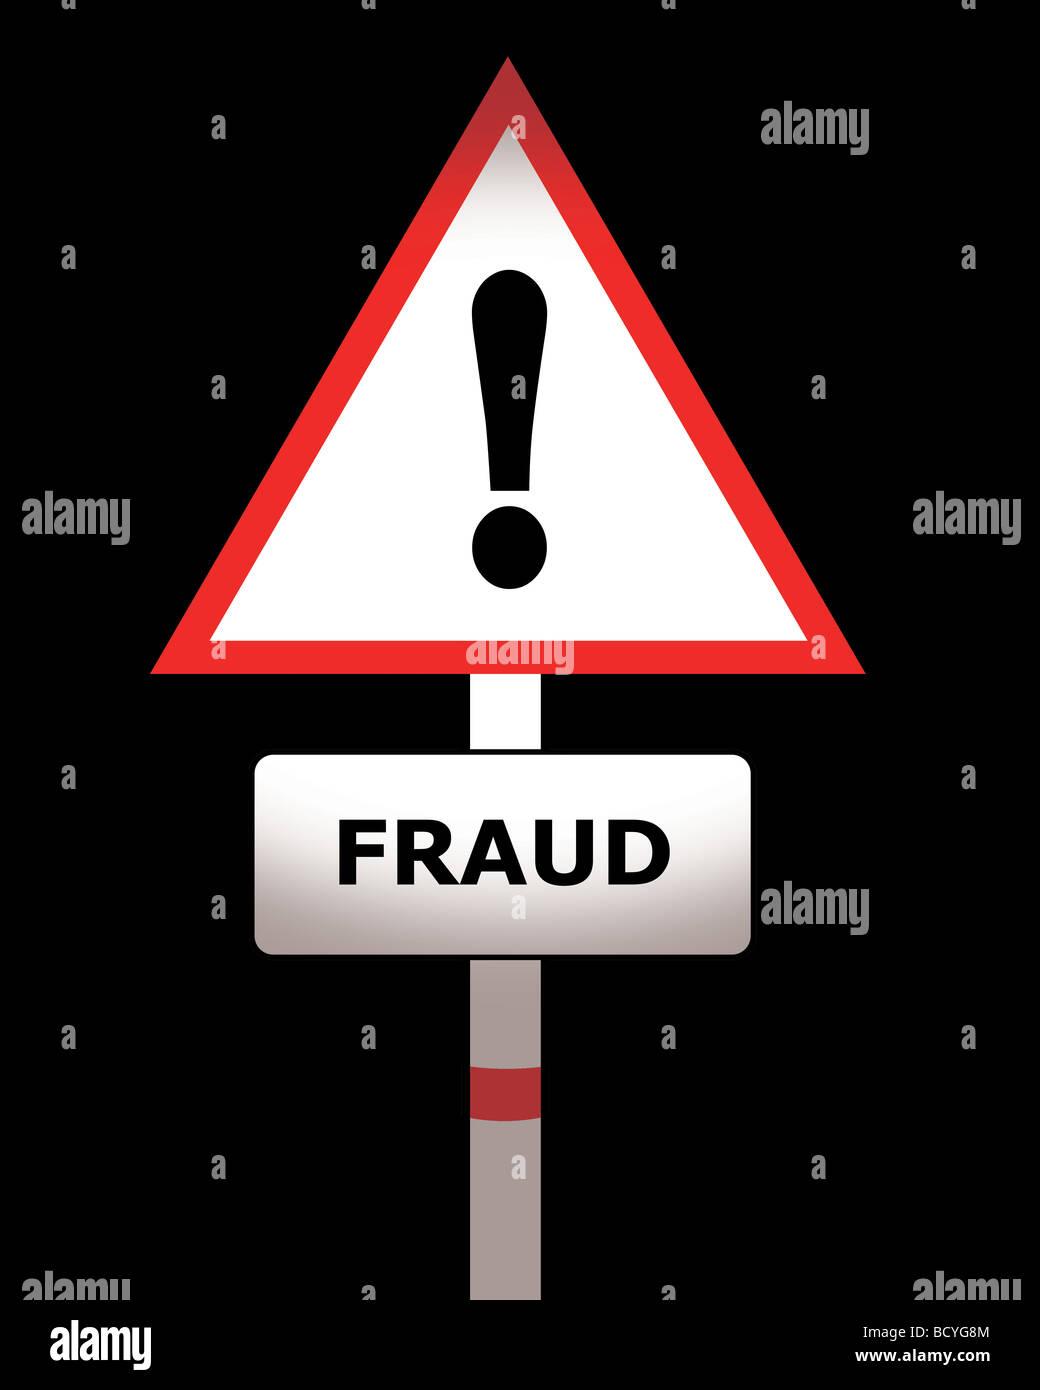 fraud - Stock Image